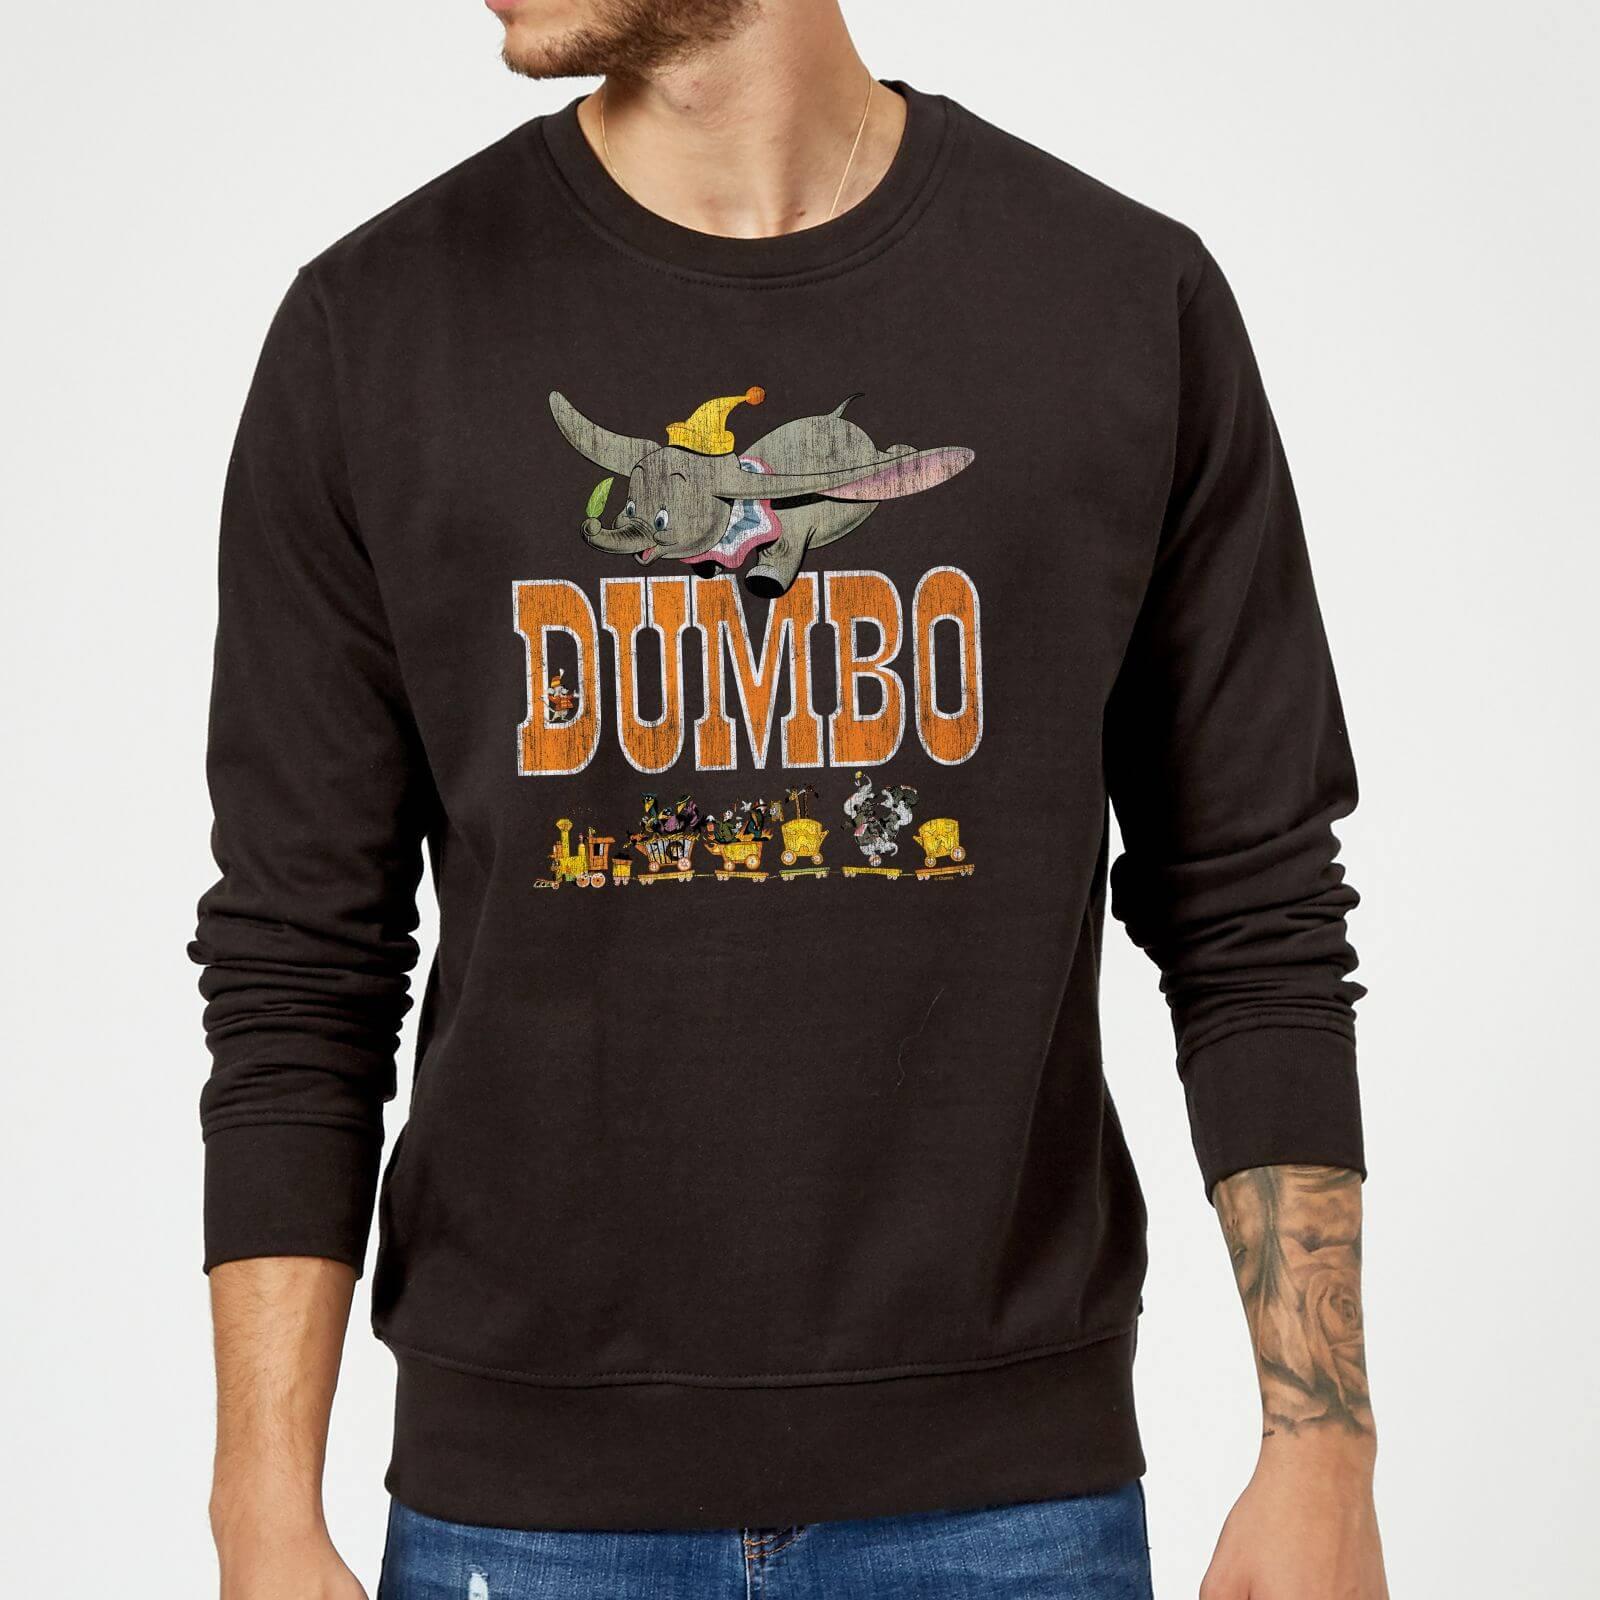 Disney Dumbo The One The Only Sweatshirt - Black - 5XL - Black